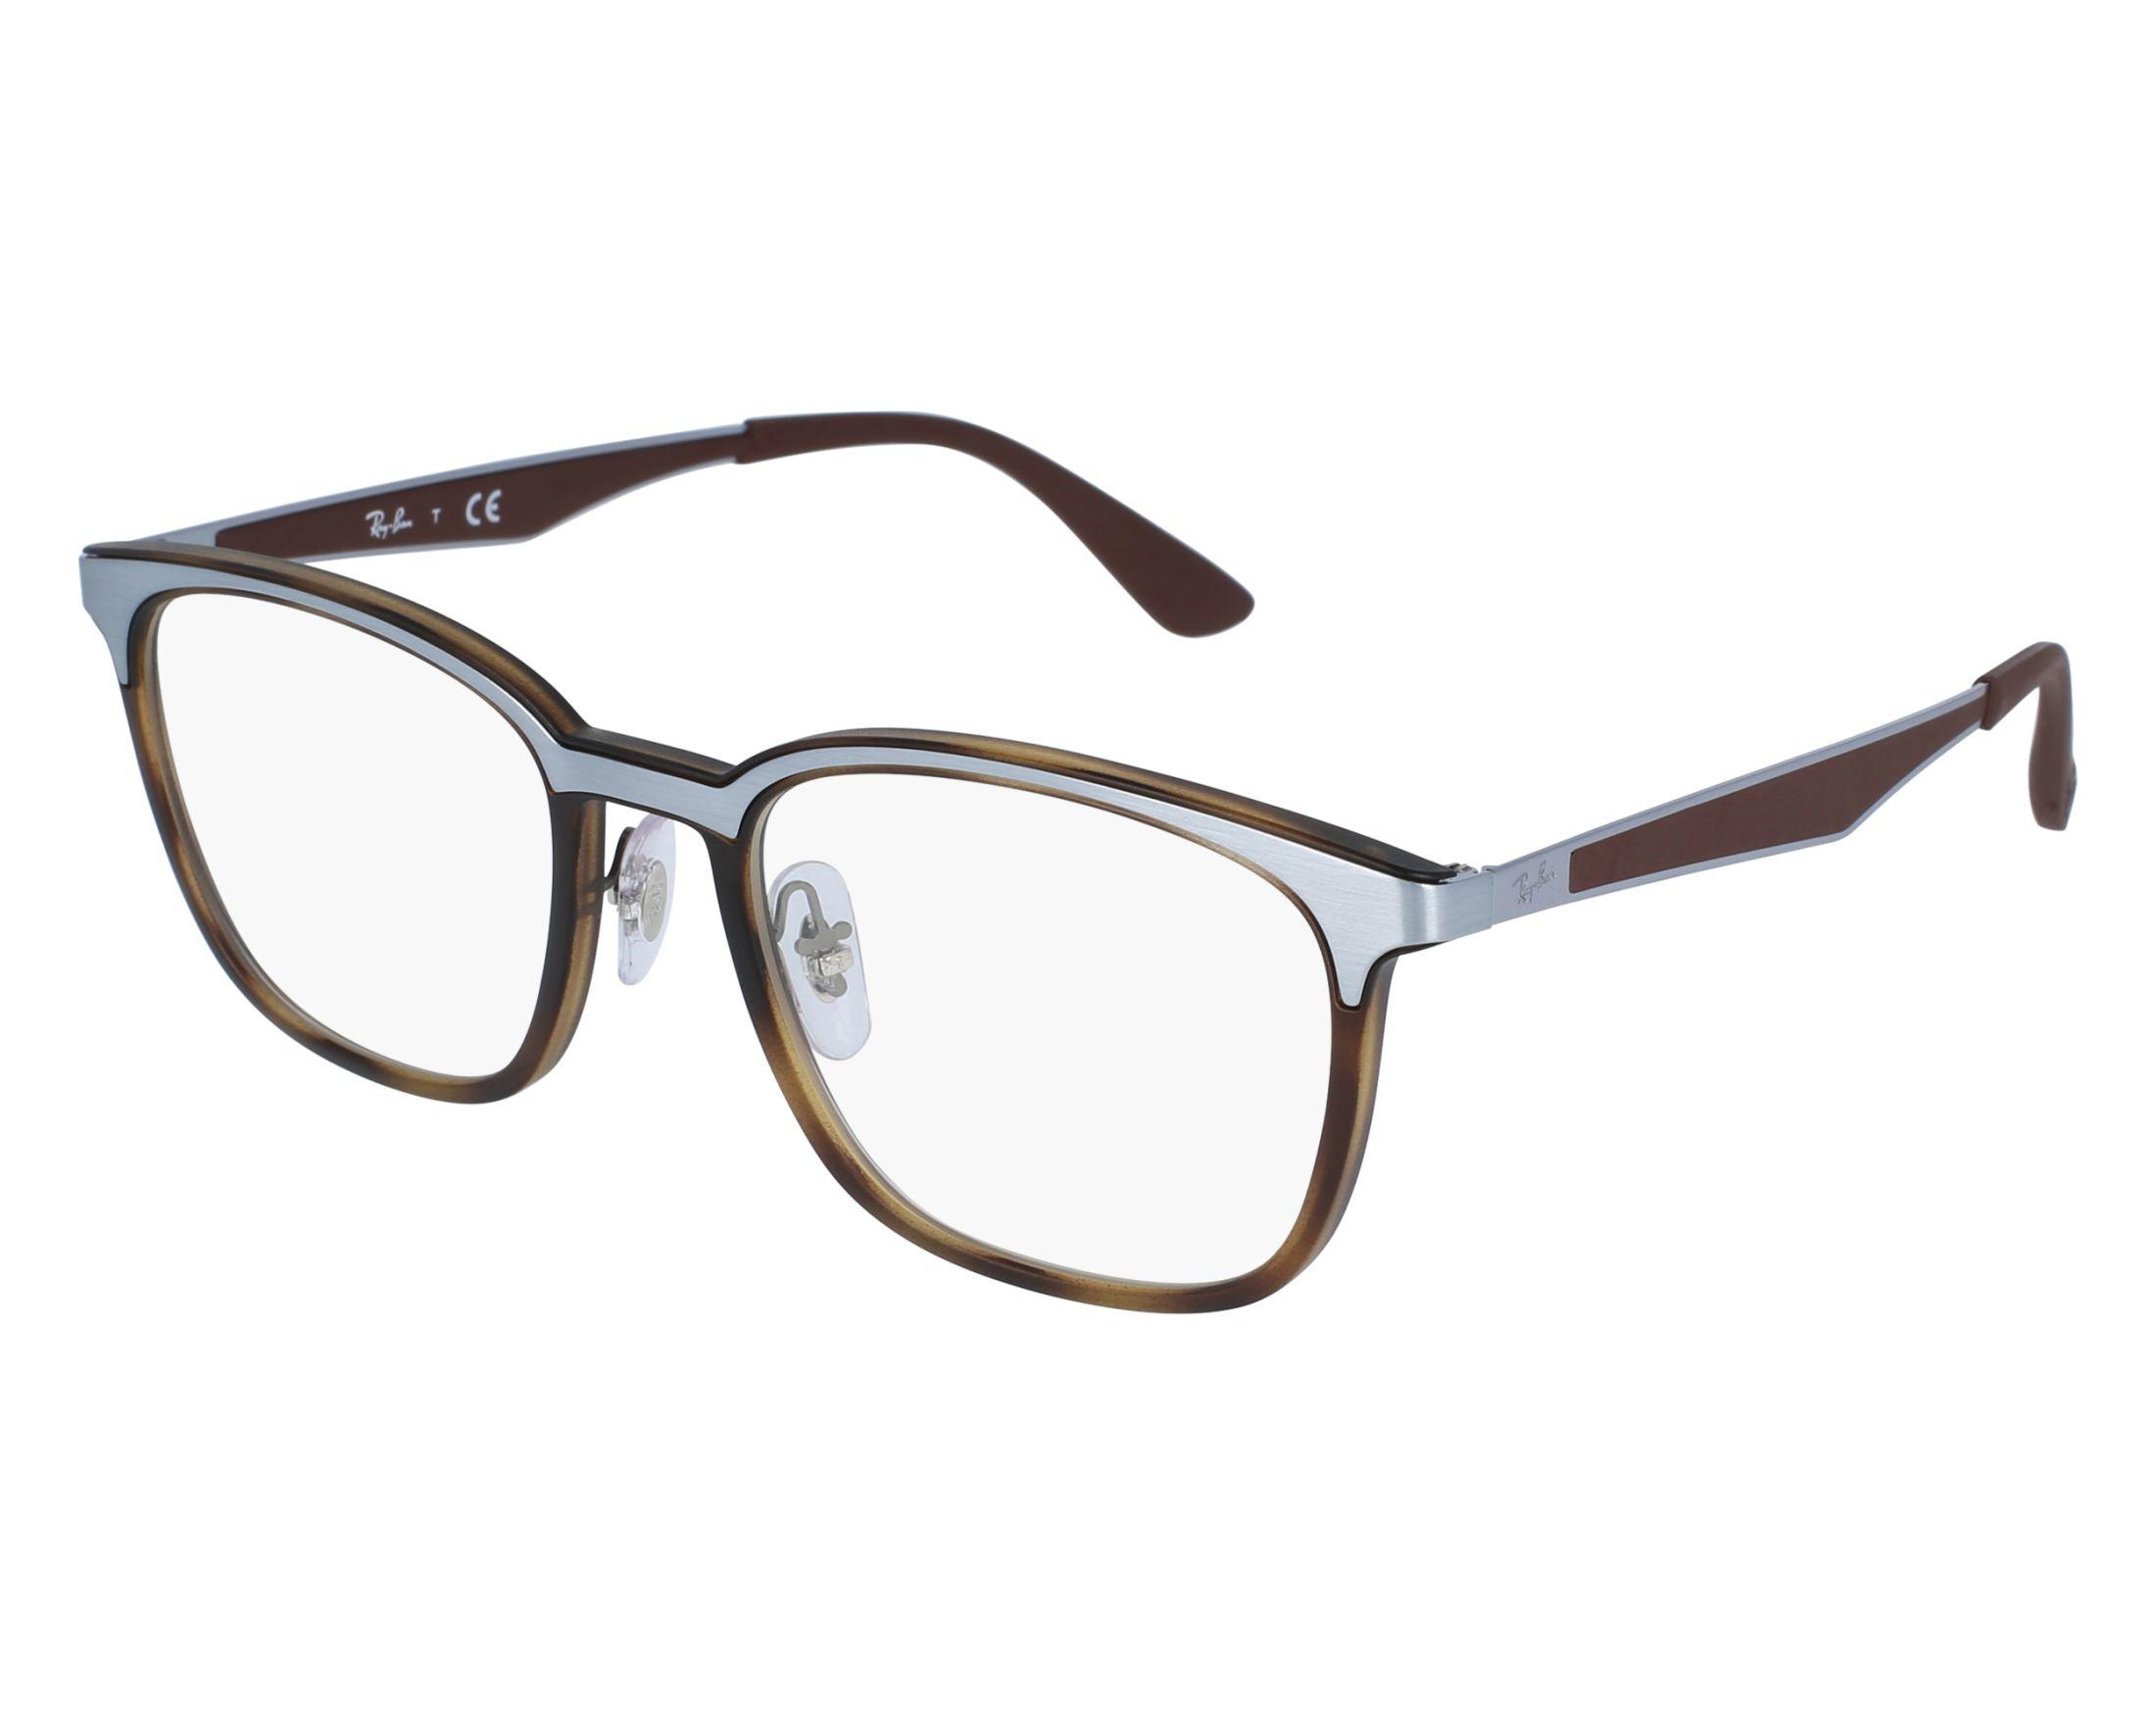 5e532312e5 eyeglasses Ray-Ban RX-7117 8016 52-19 Havana Brown front view